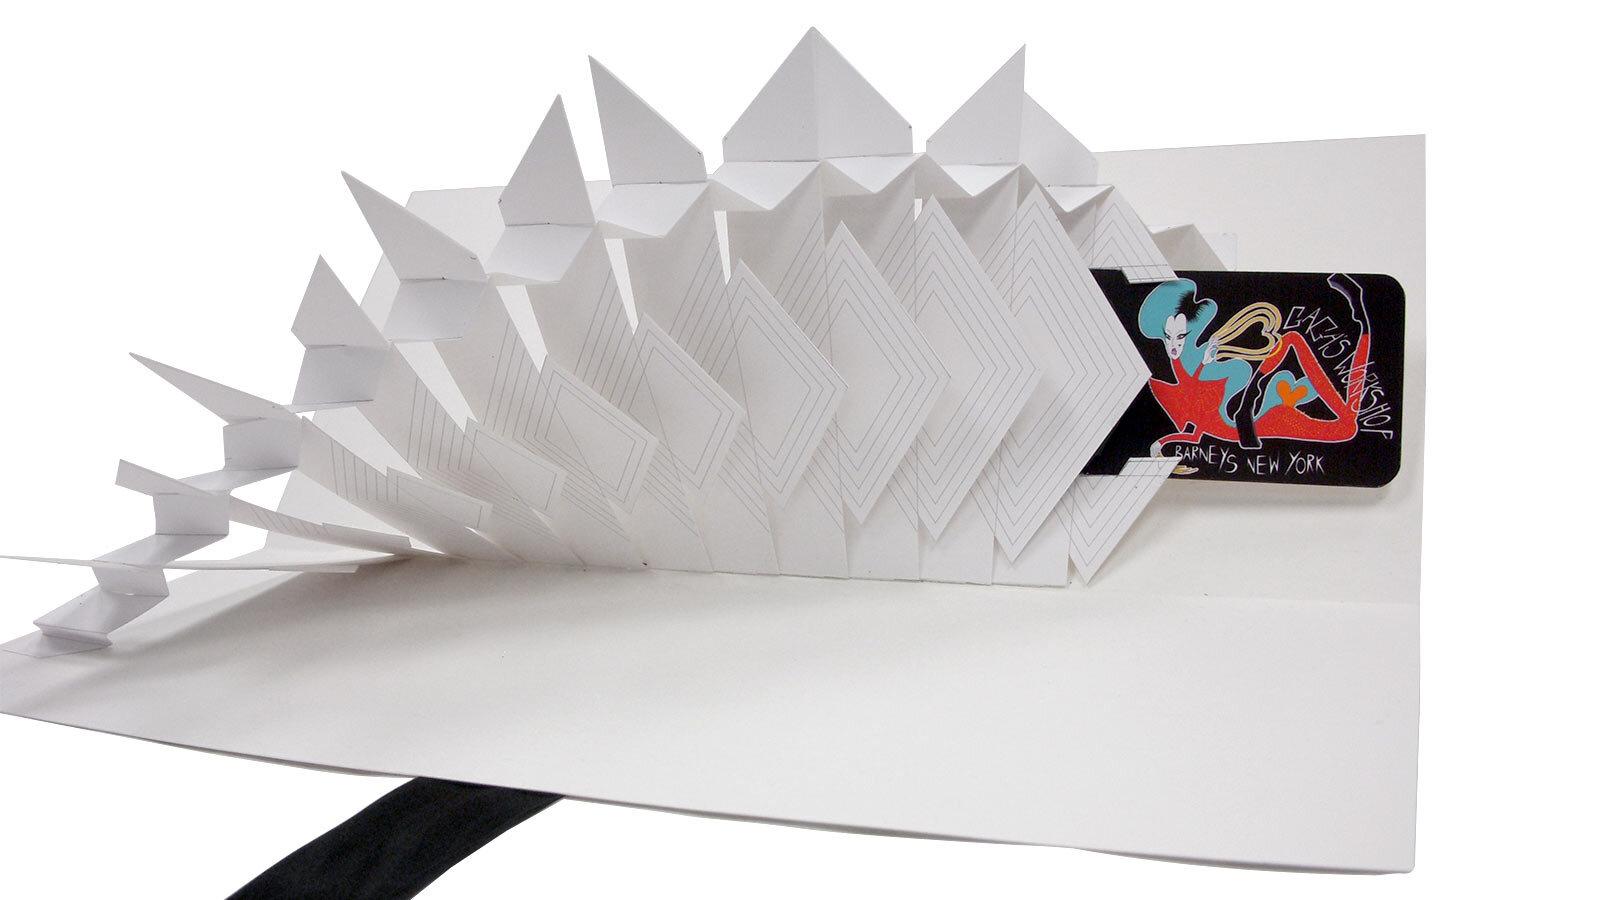 Barneys-New-York-Lady-Gaga设计 - 包装-2.2.jpg